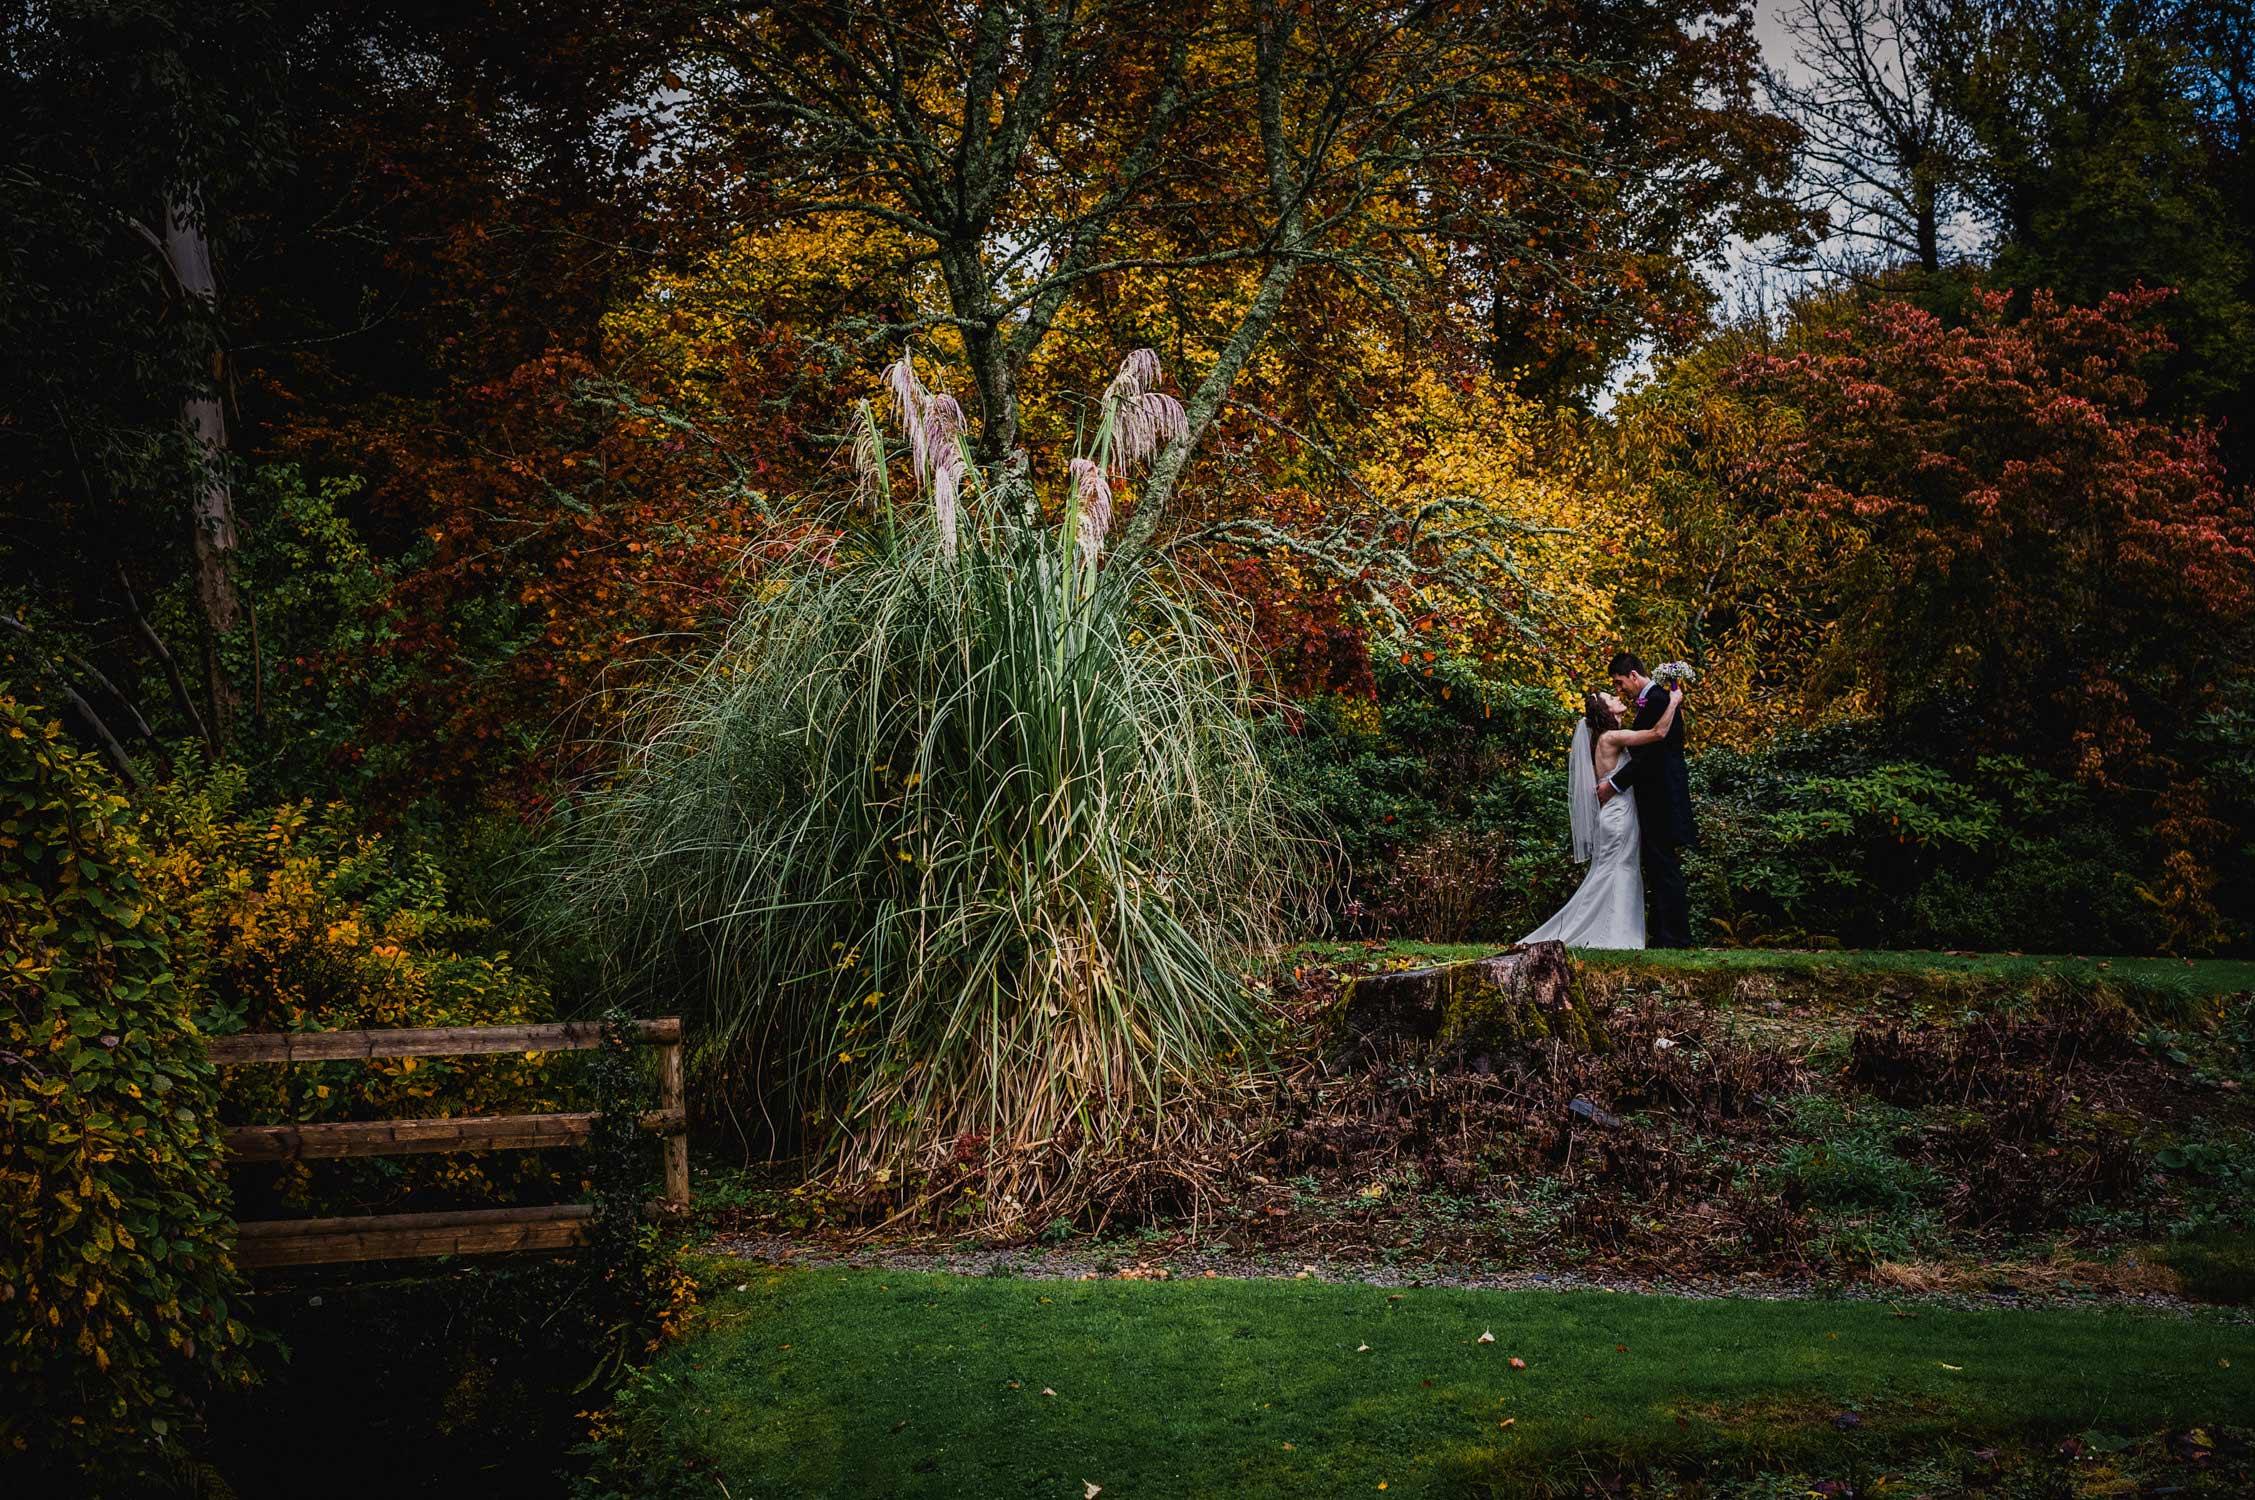 lewtrenchard wedding photographer devon, bride and groom at lewtrenchard manor in devon